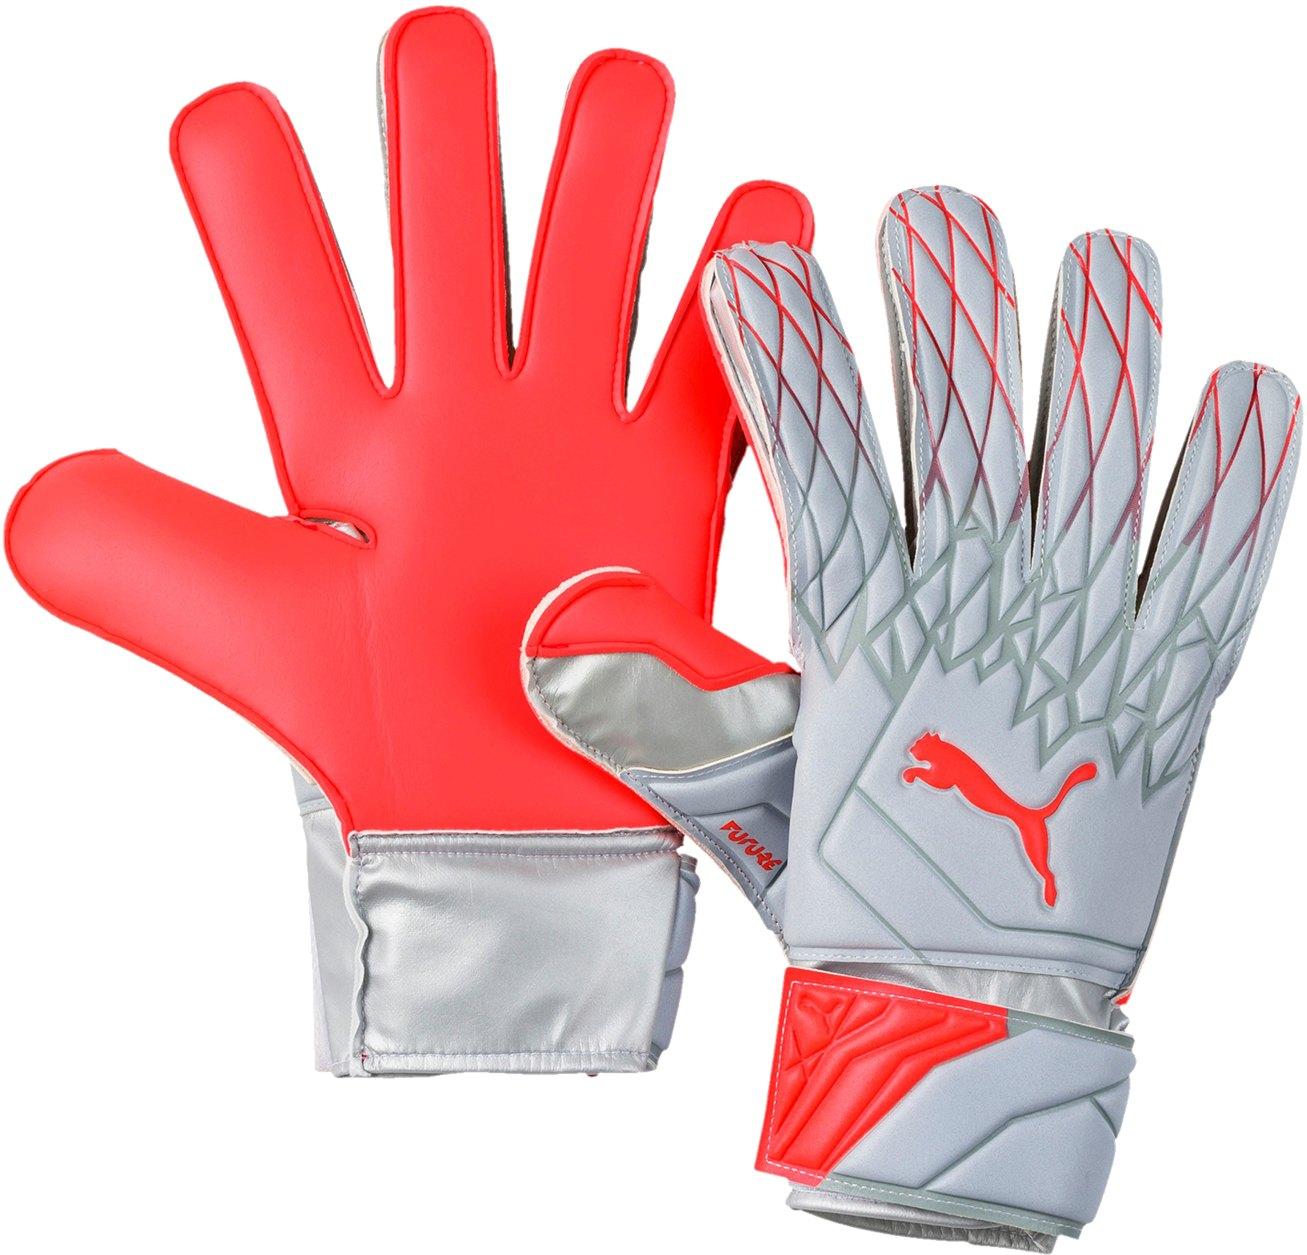 PUMA FUTURE Grip 19.4 TW-Handschuh Grau Rot F01 - Grau